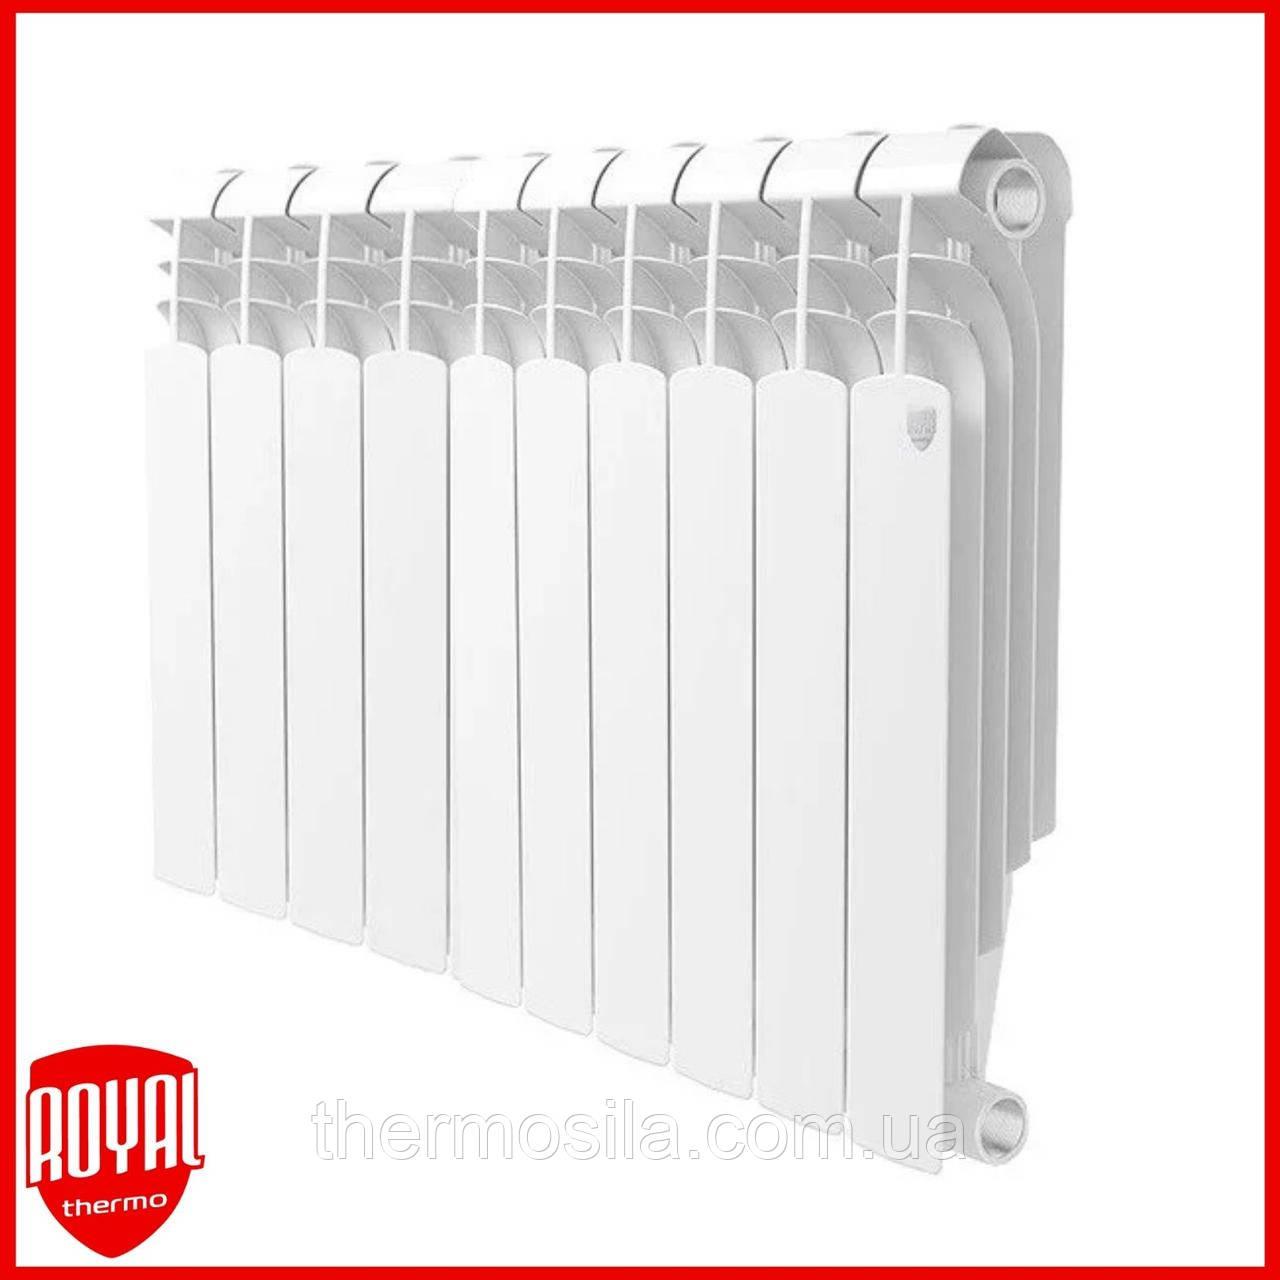 Радиатор биметаллический Royal Thermo Violento BM 500 - 1 секция